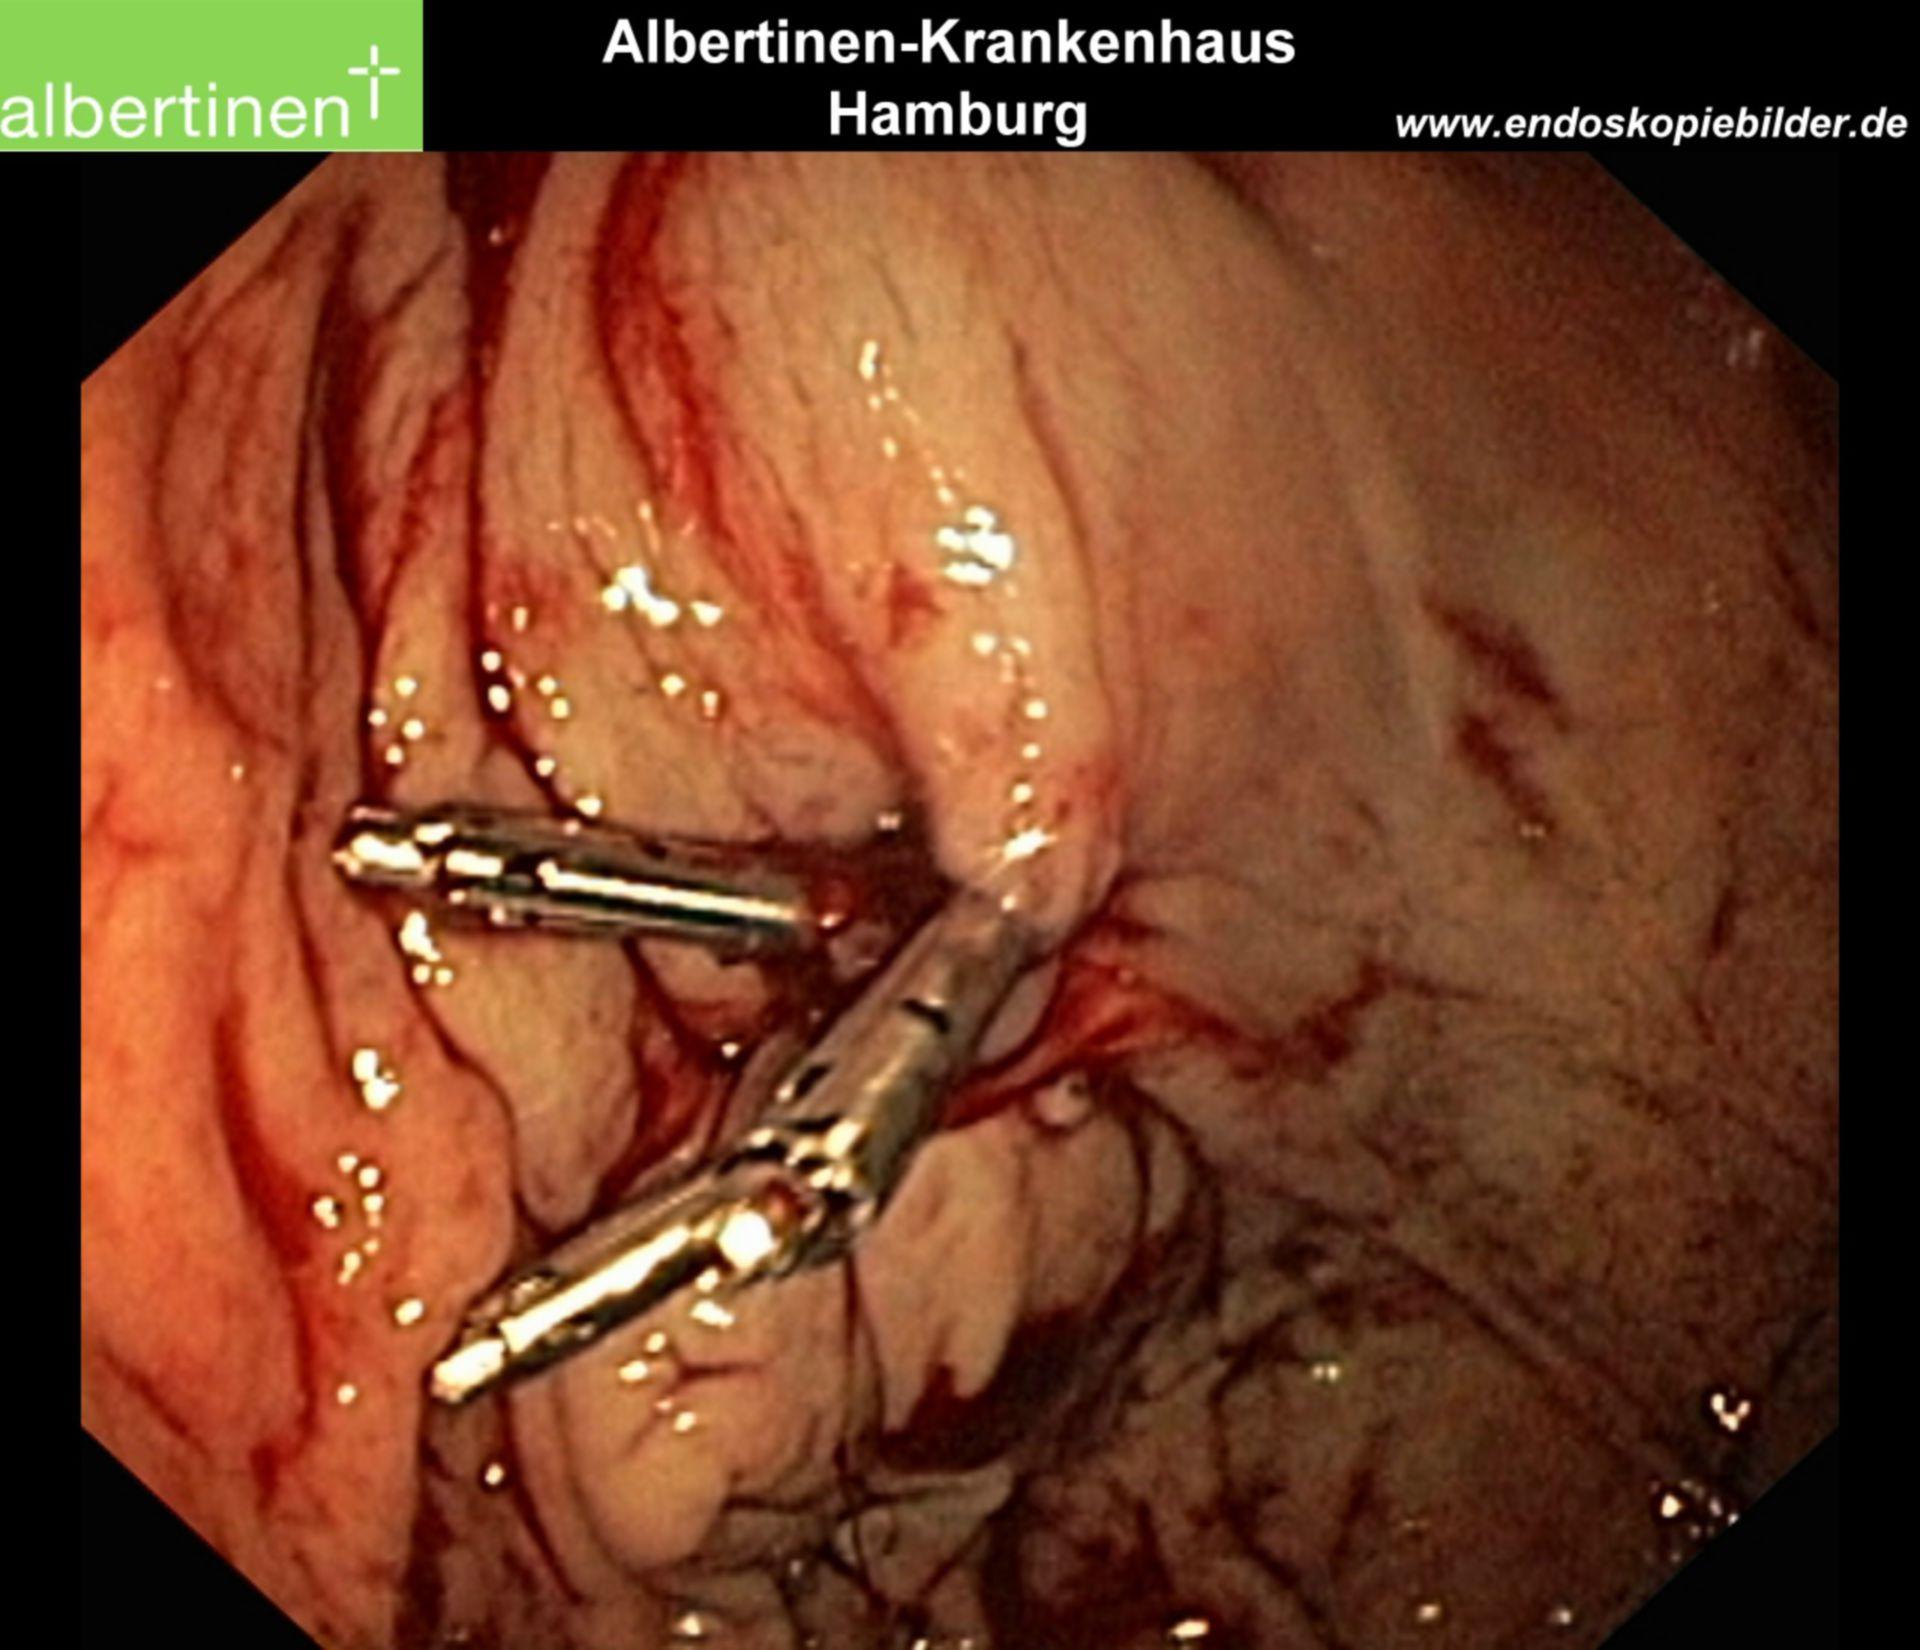 Endoscopy: Forrest 2a hemorrhage